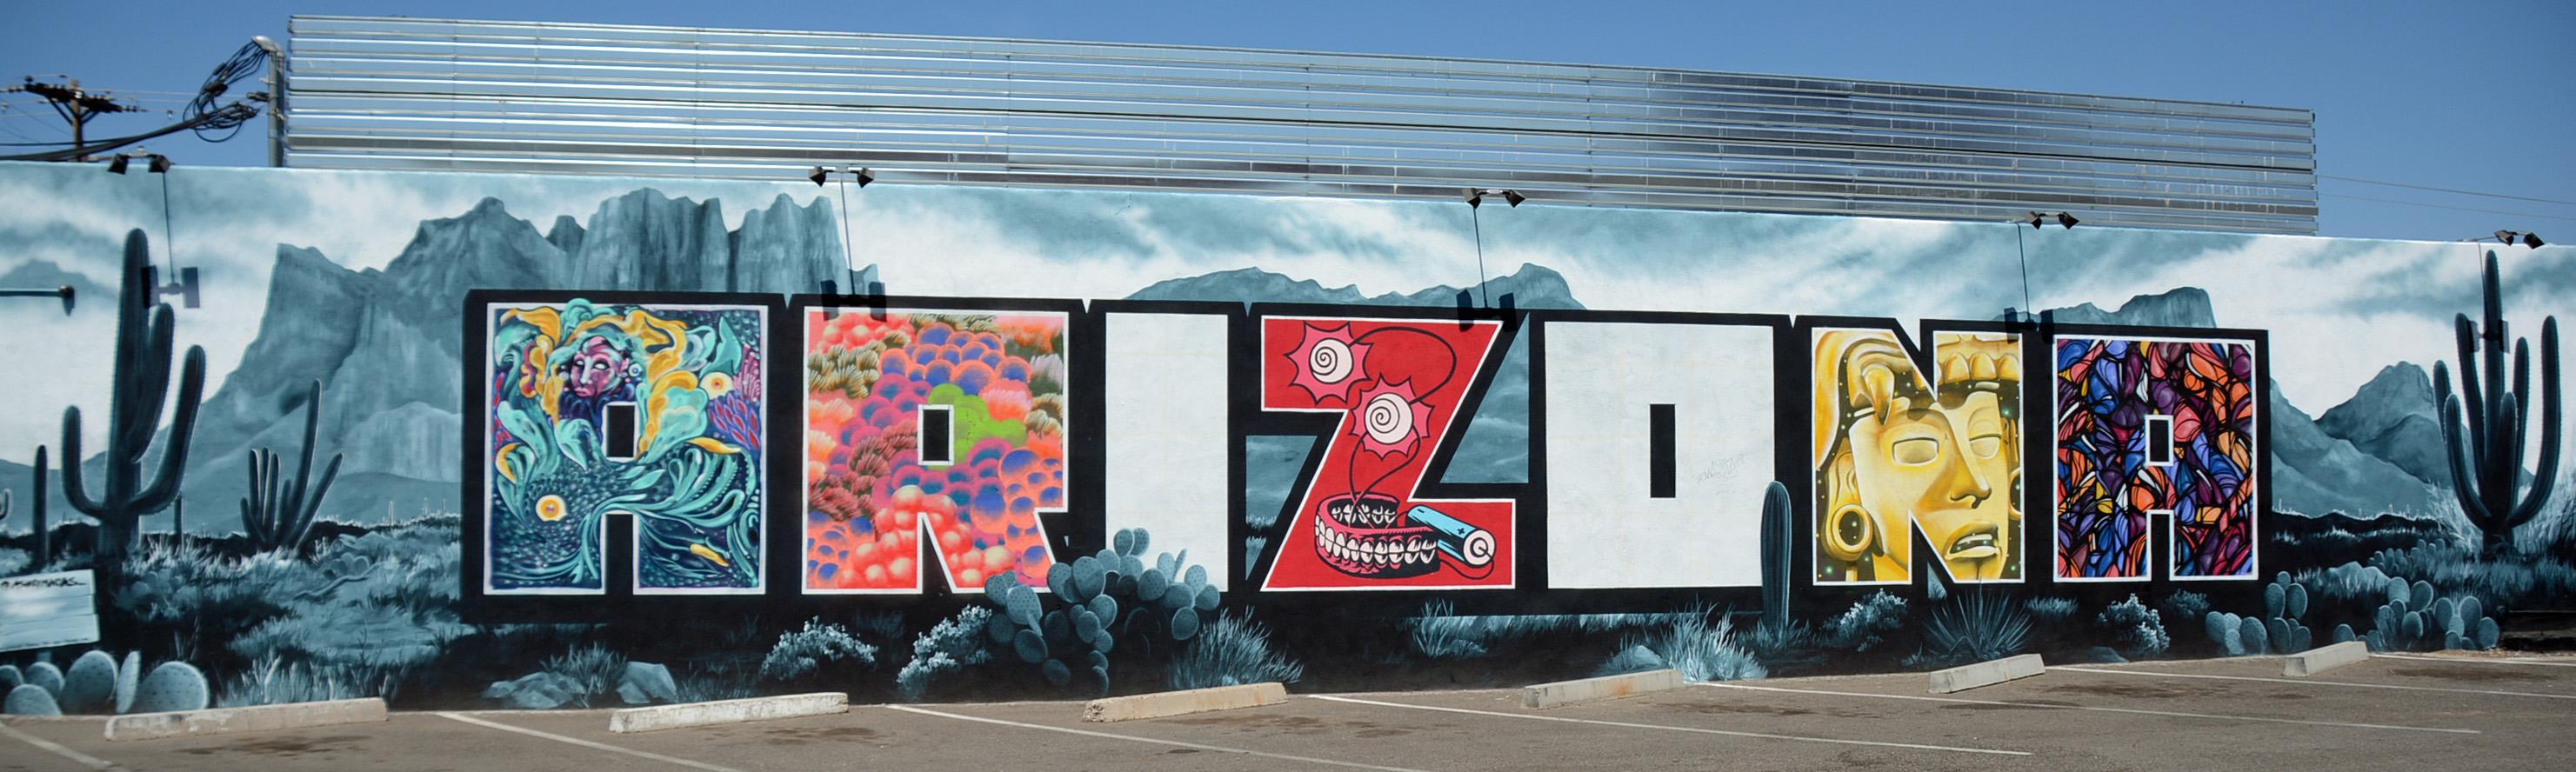 AZ Mural Rebel Lounge_edited-1